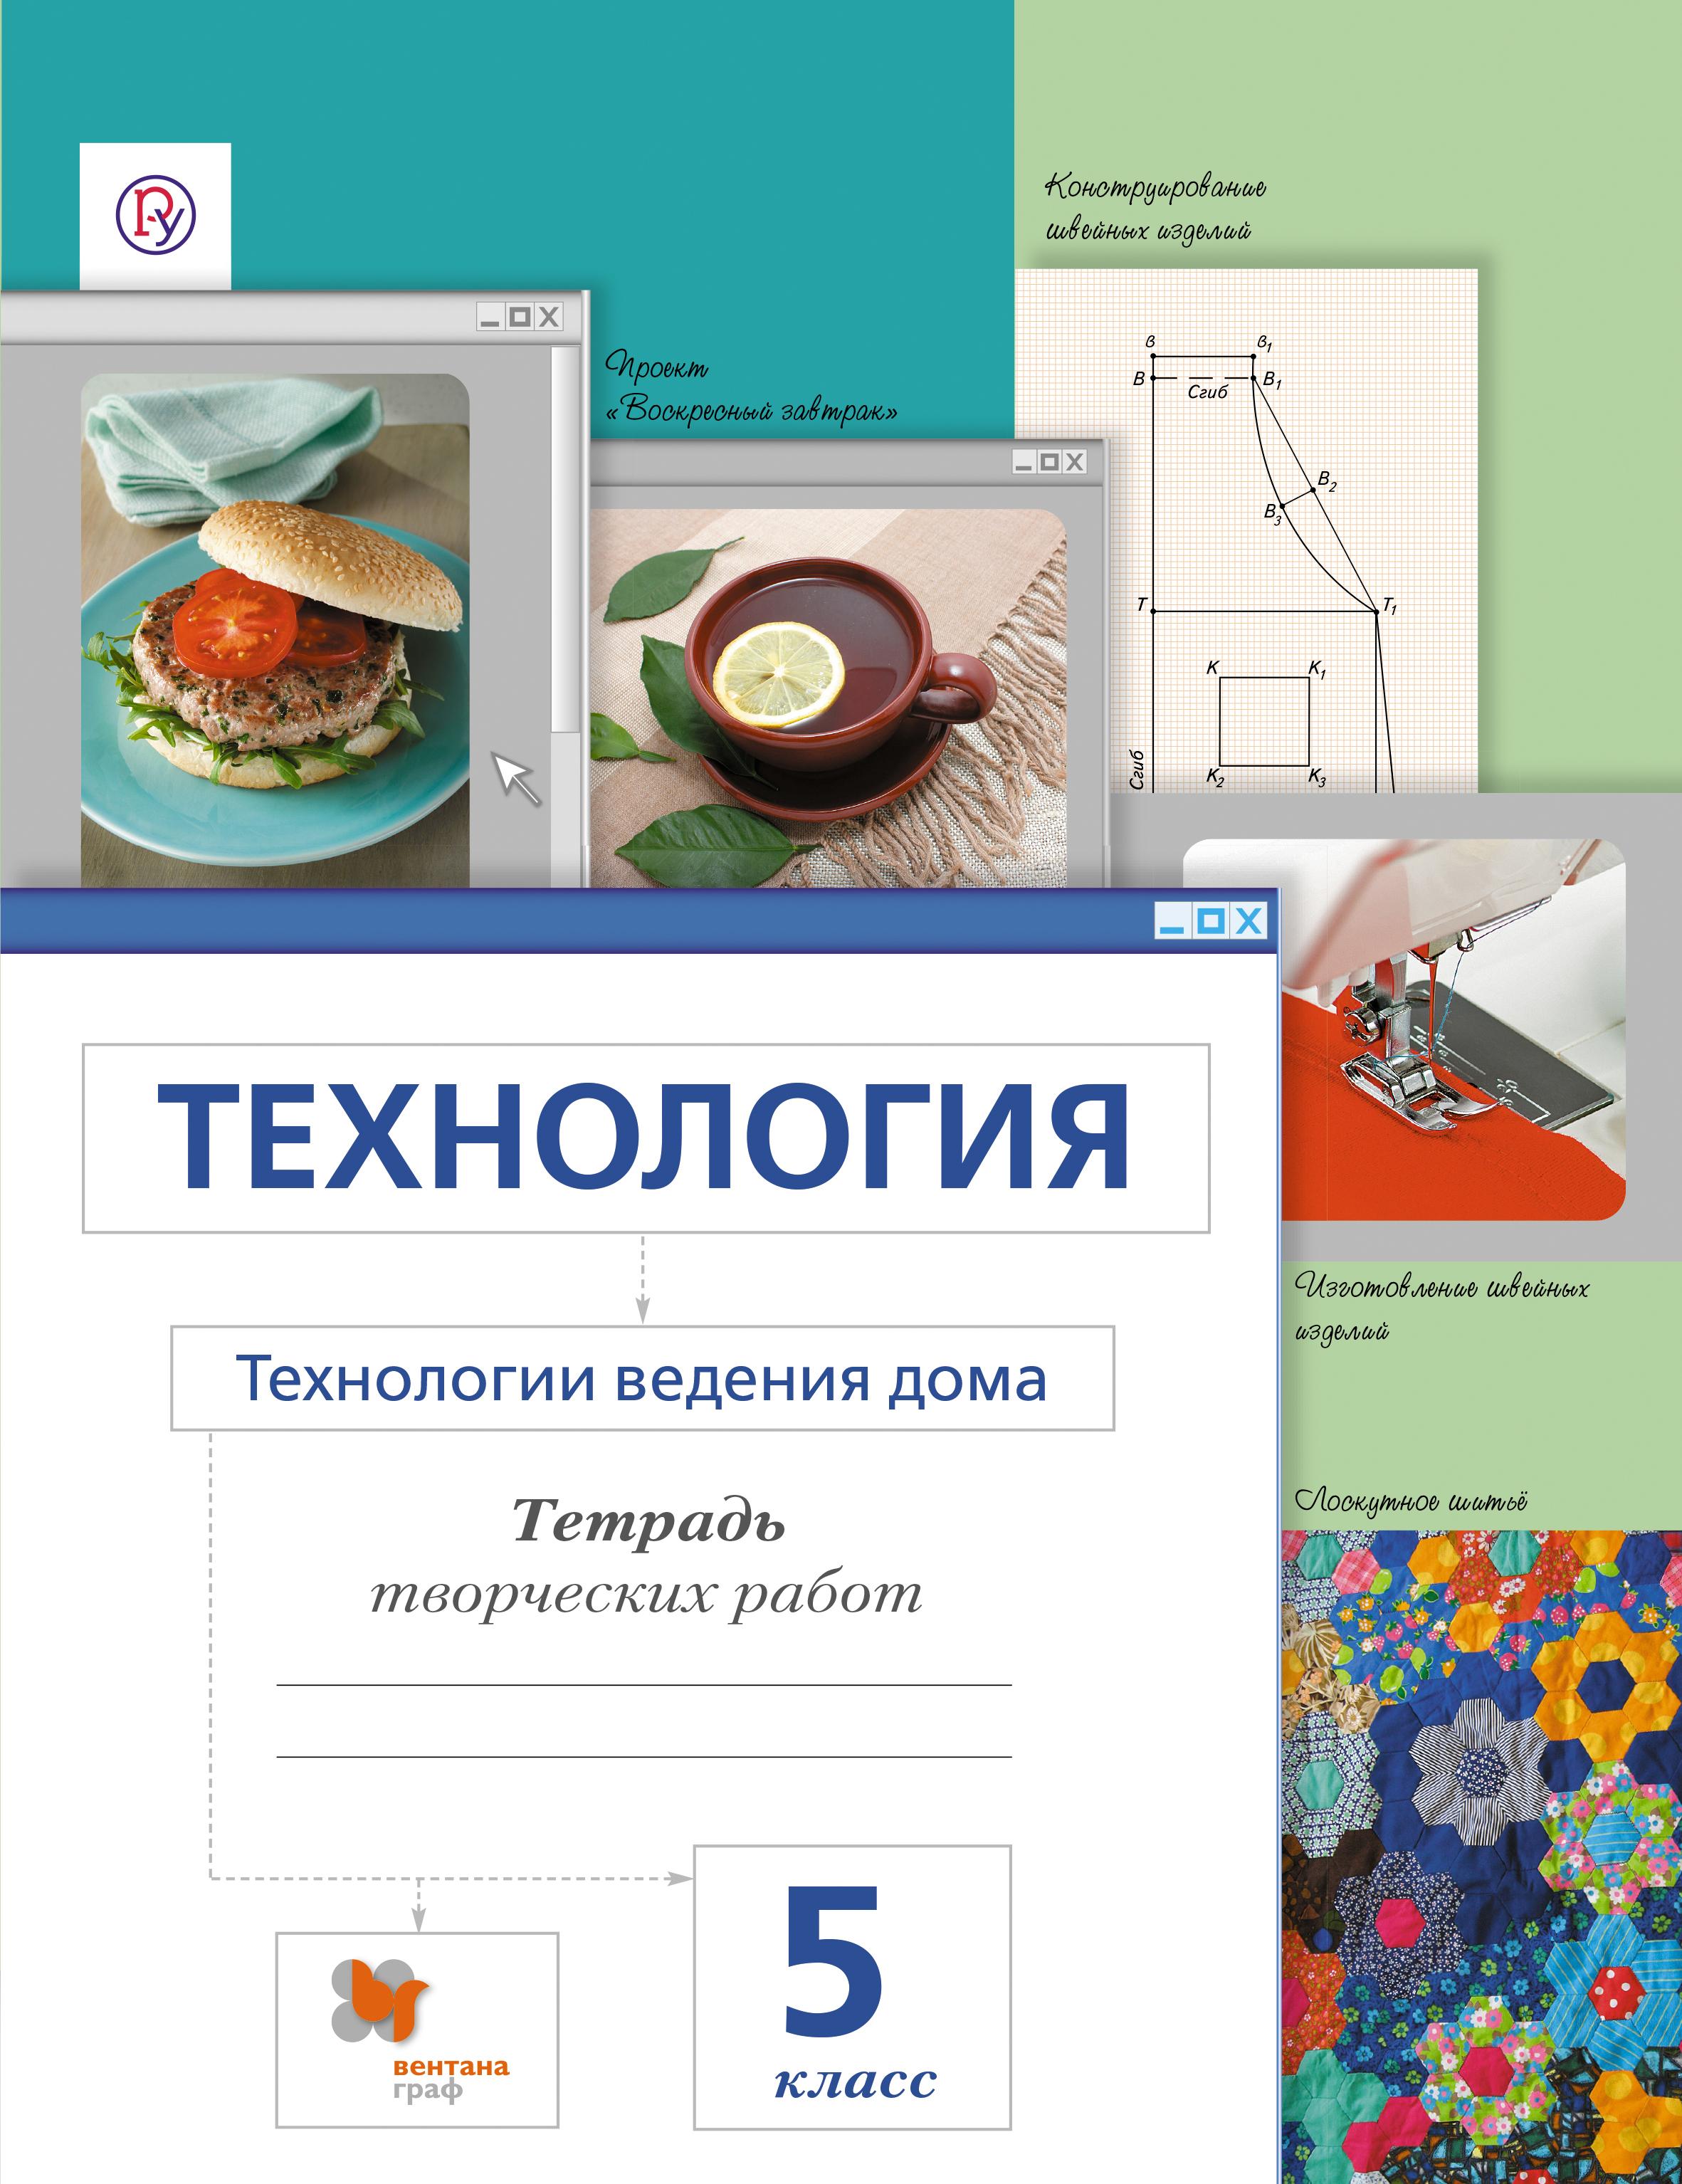 Технология. Технологии ведения дома. 5класс. Рабочая тетрадь. ( Сасова И.А., Ширина Н.И., Захарова Н.А.  )